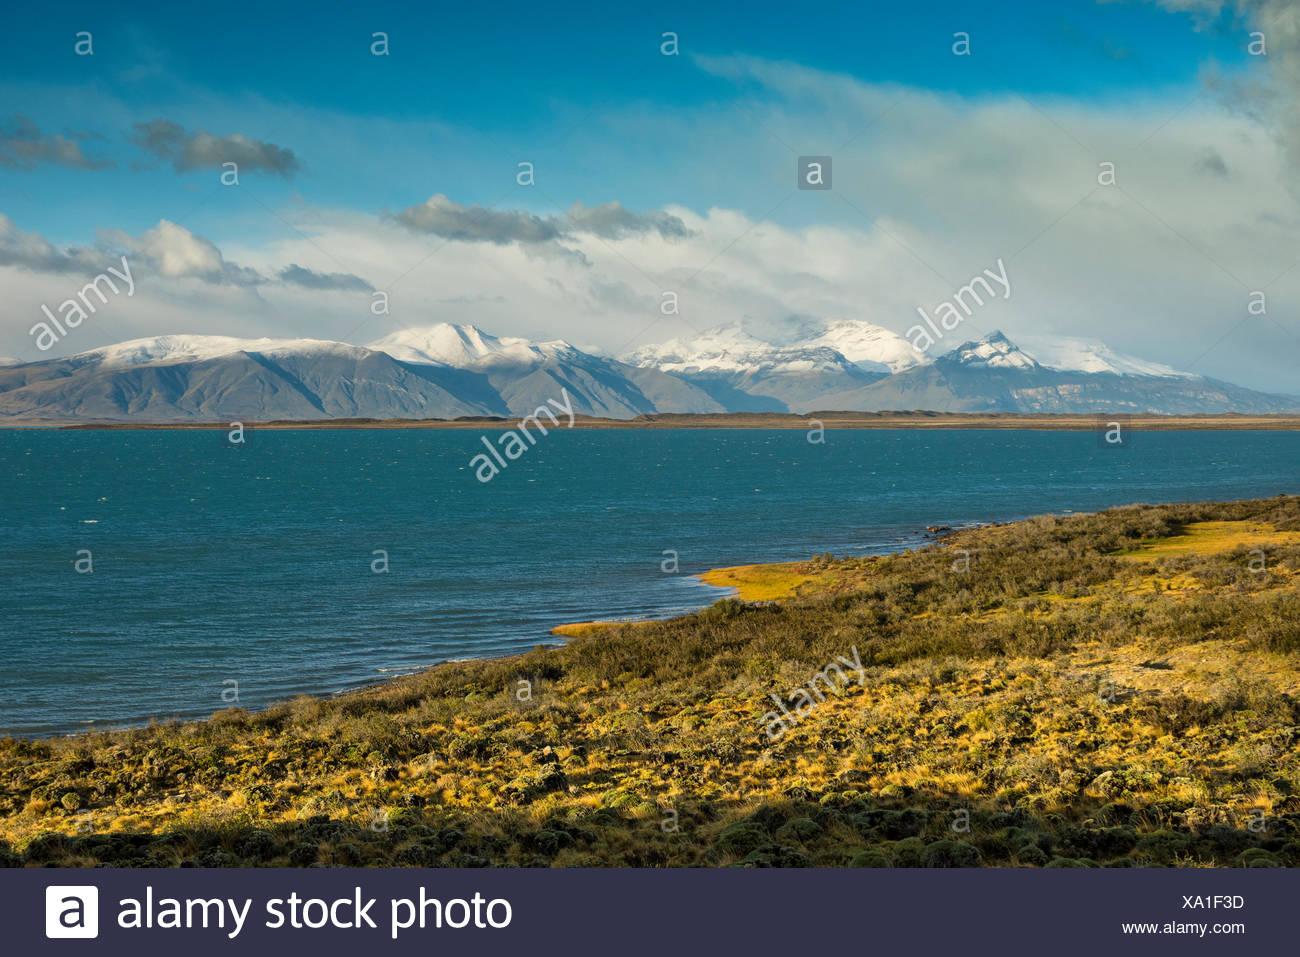 South America,Argentina,Patagonia,Santa Cruz,Puerta Bandera,Lago Argentino - Stock Image